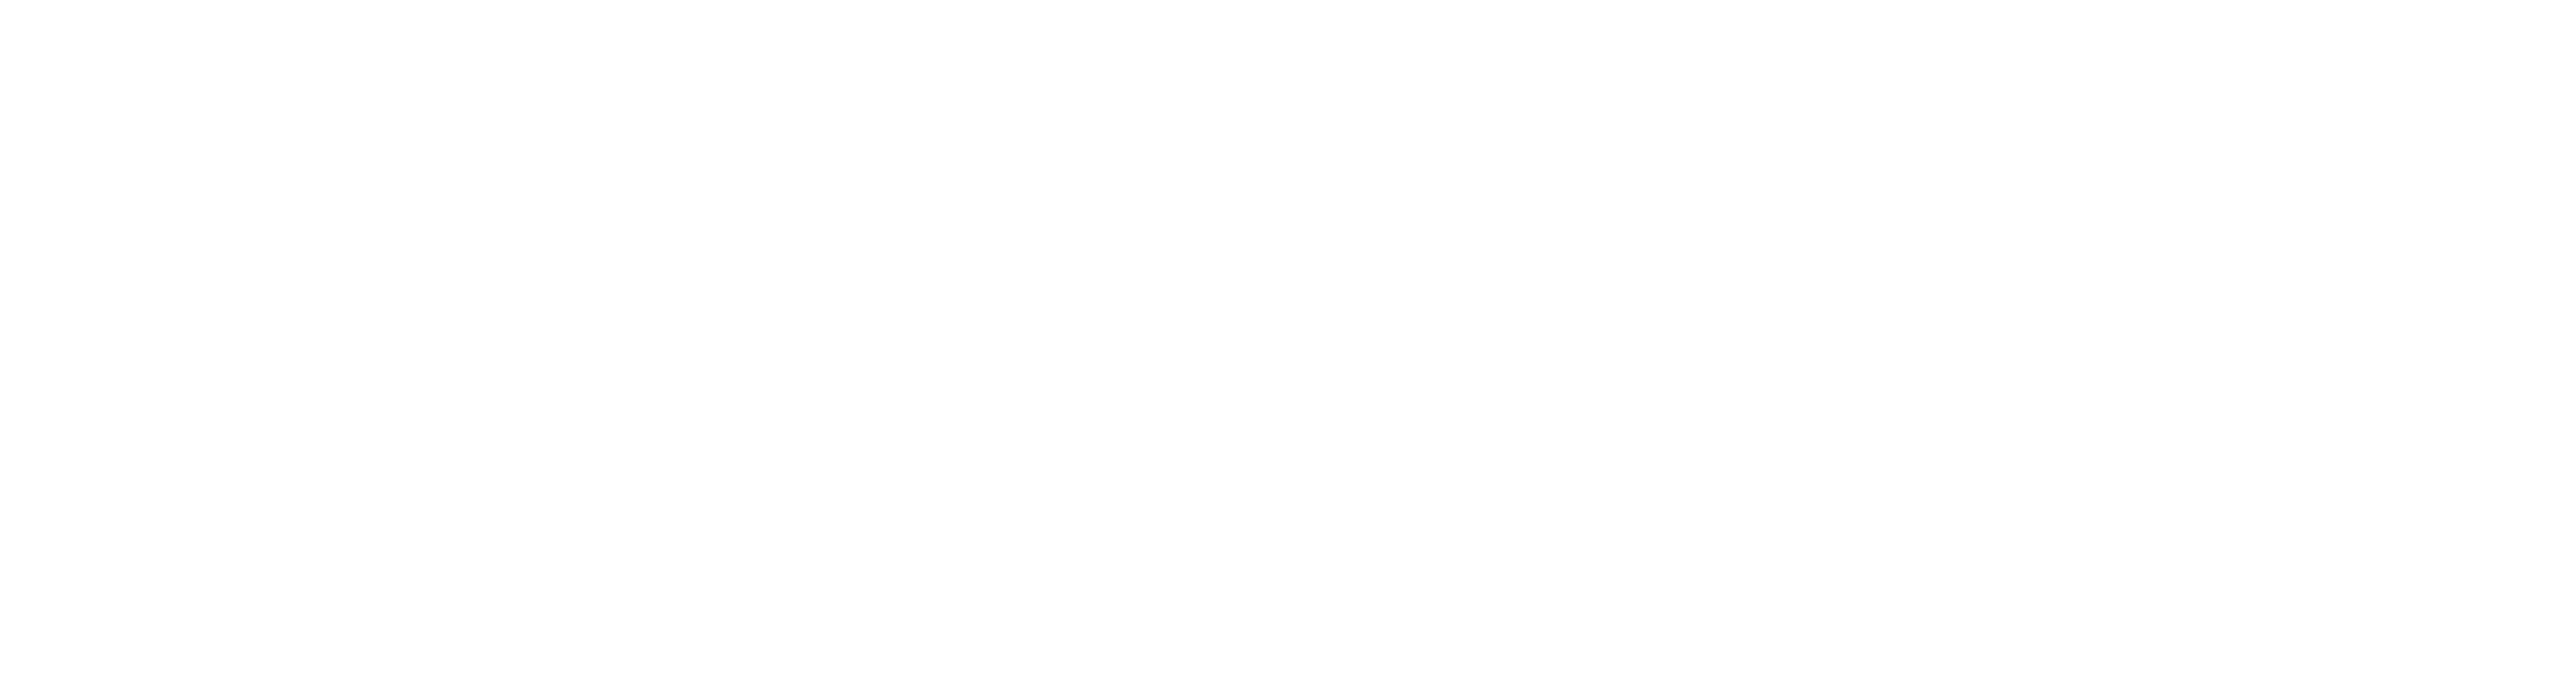 Leaders logo